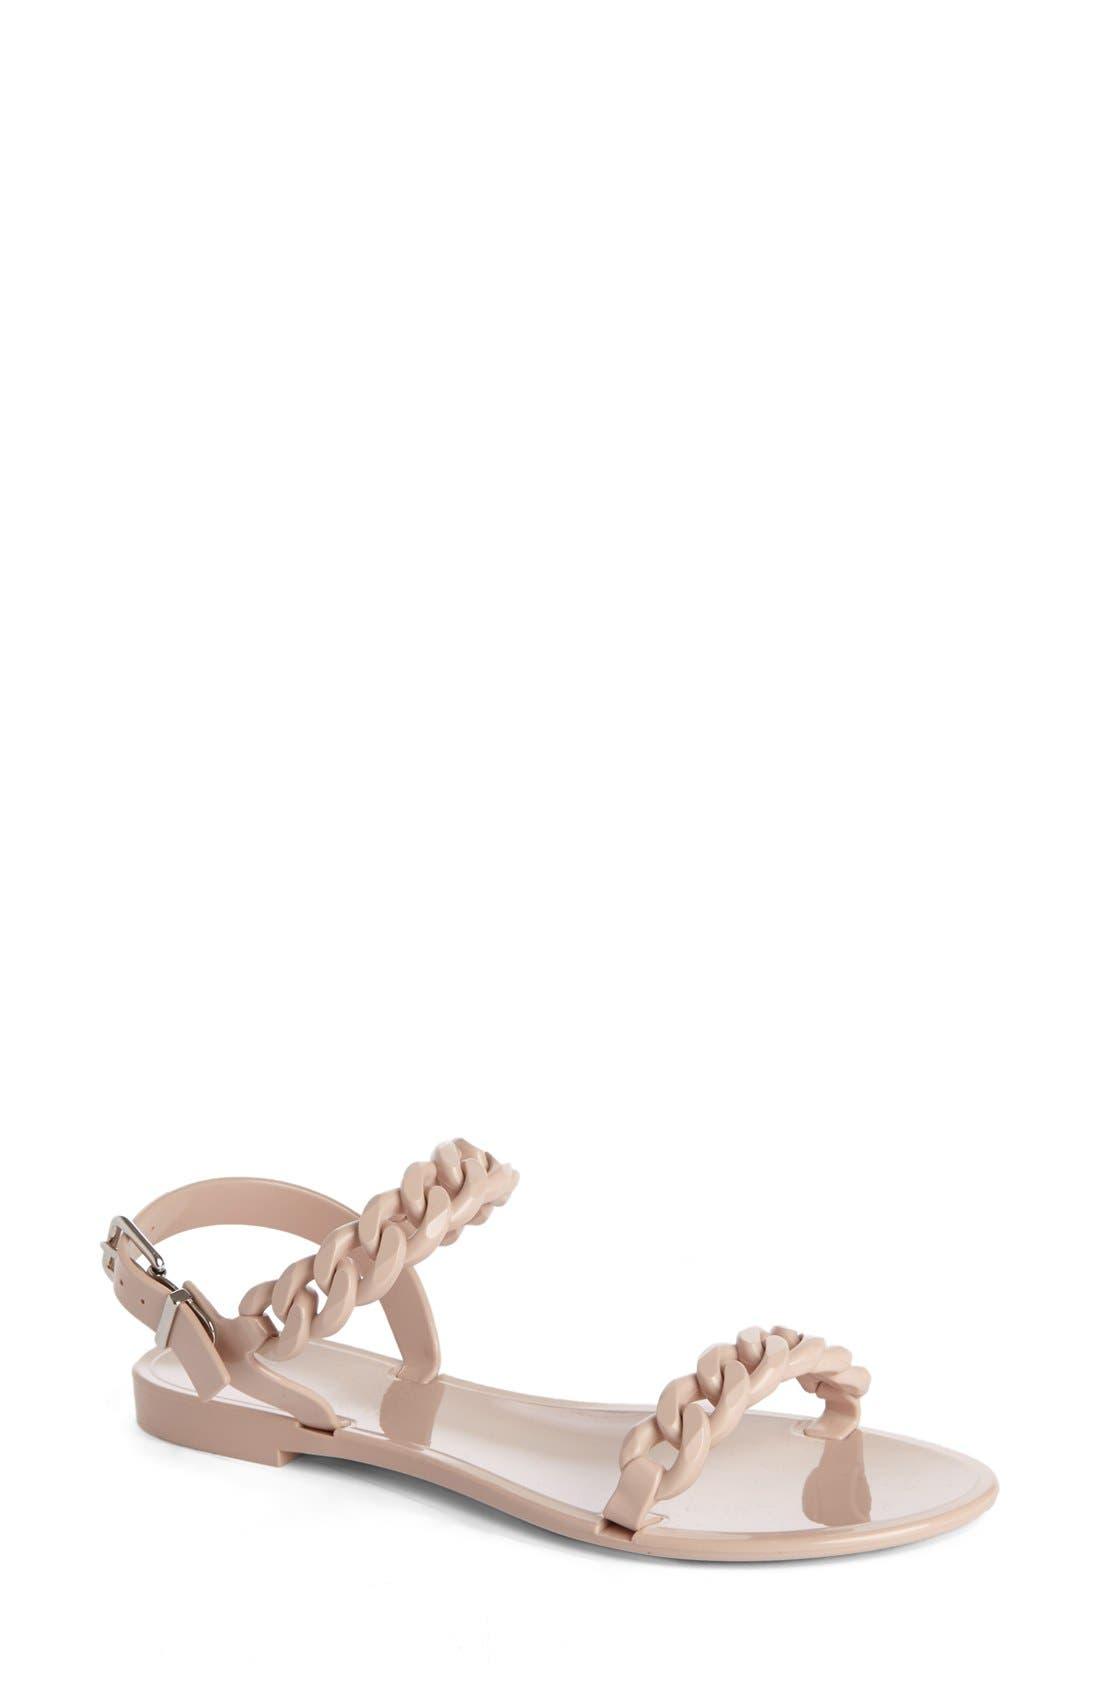 Alternate Image 1 Selected - Givenchy'NeaChain' Logo Jelly Sandal (Women)